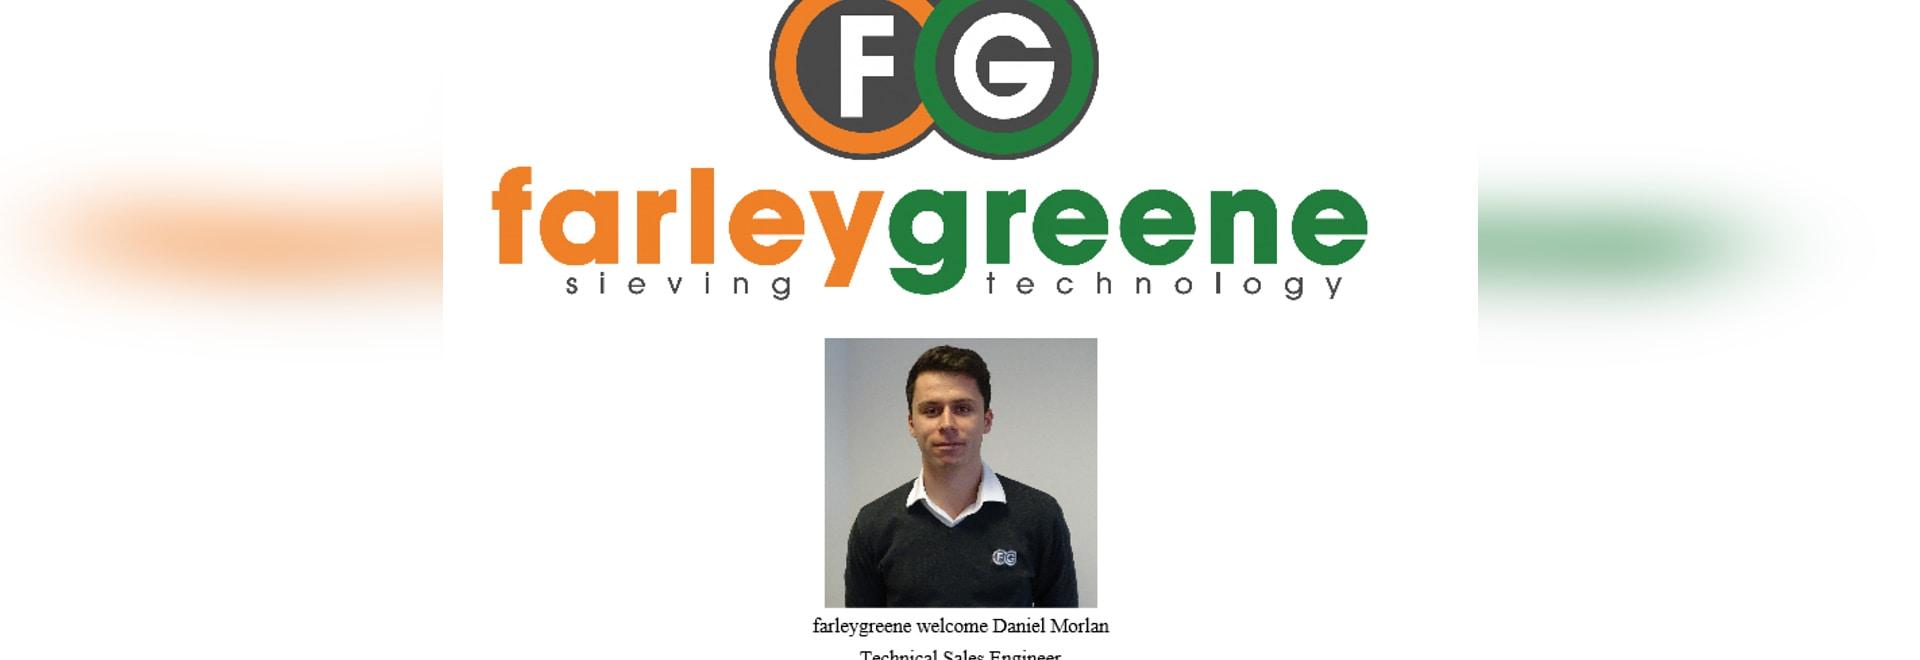 farleygreene welcome Daniel Morlan